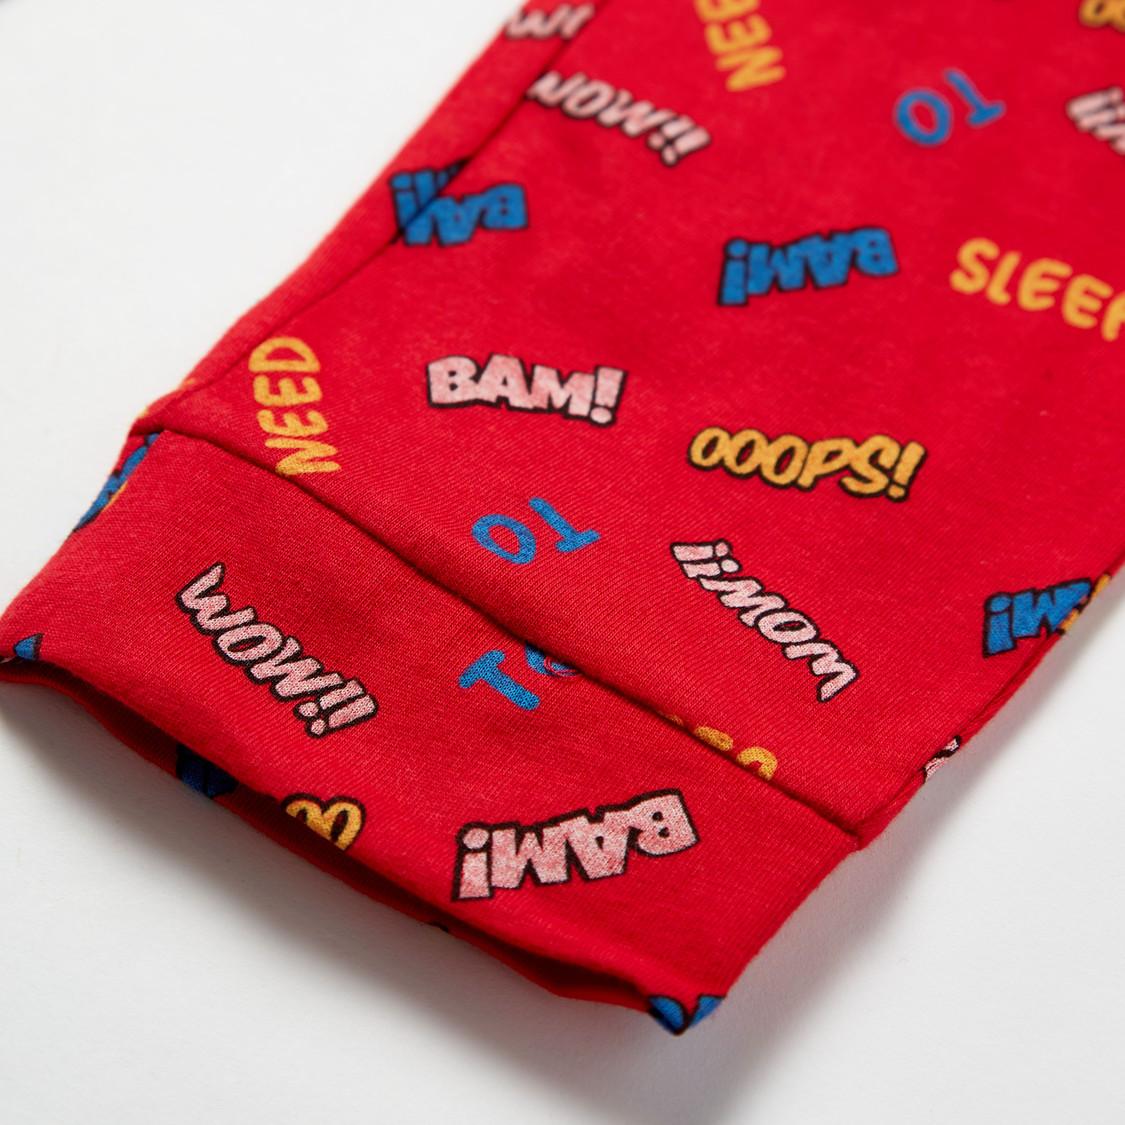 Graphic Print Long Sleeves T-shirt and All-Over Print Pyjama Set